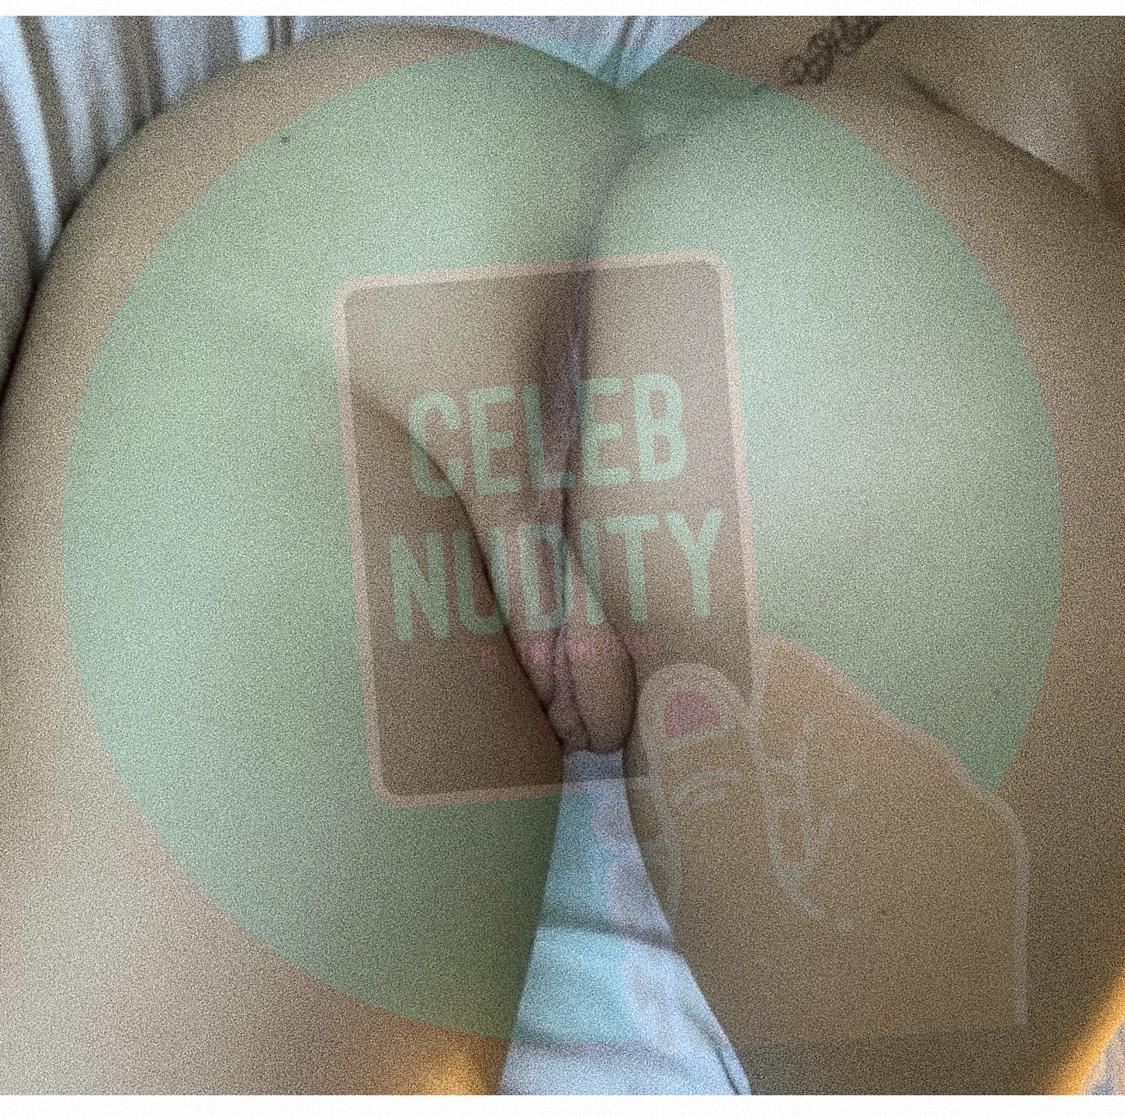 Bikini Bad Girl Club Naked Images